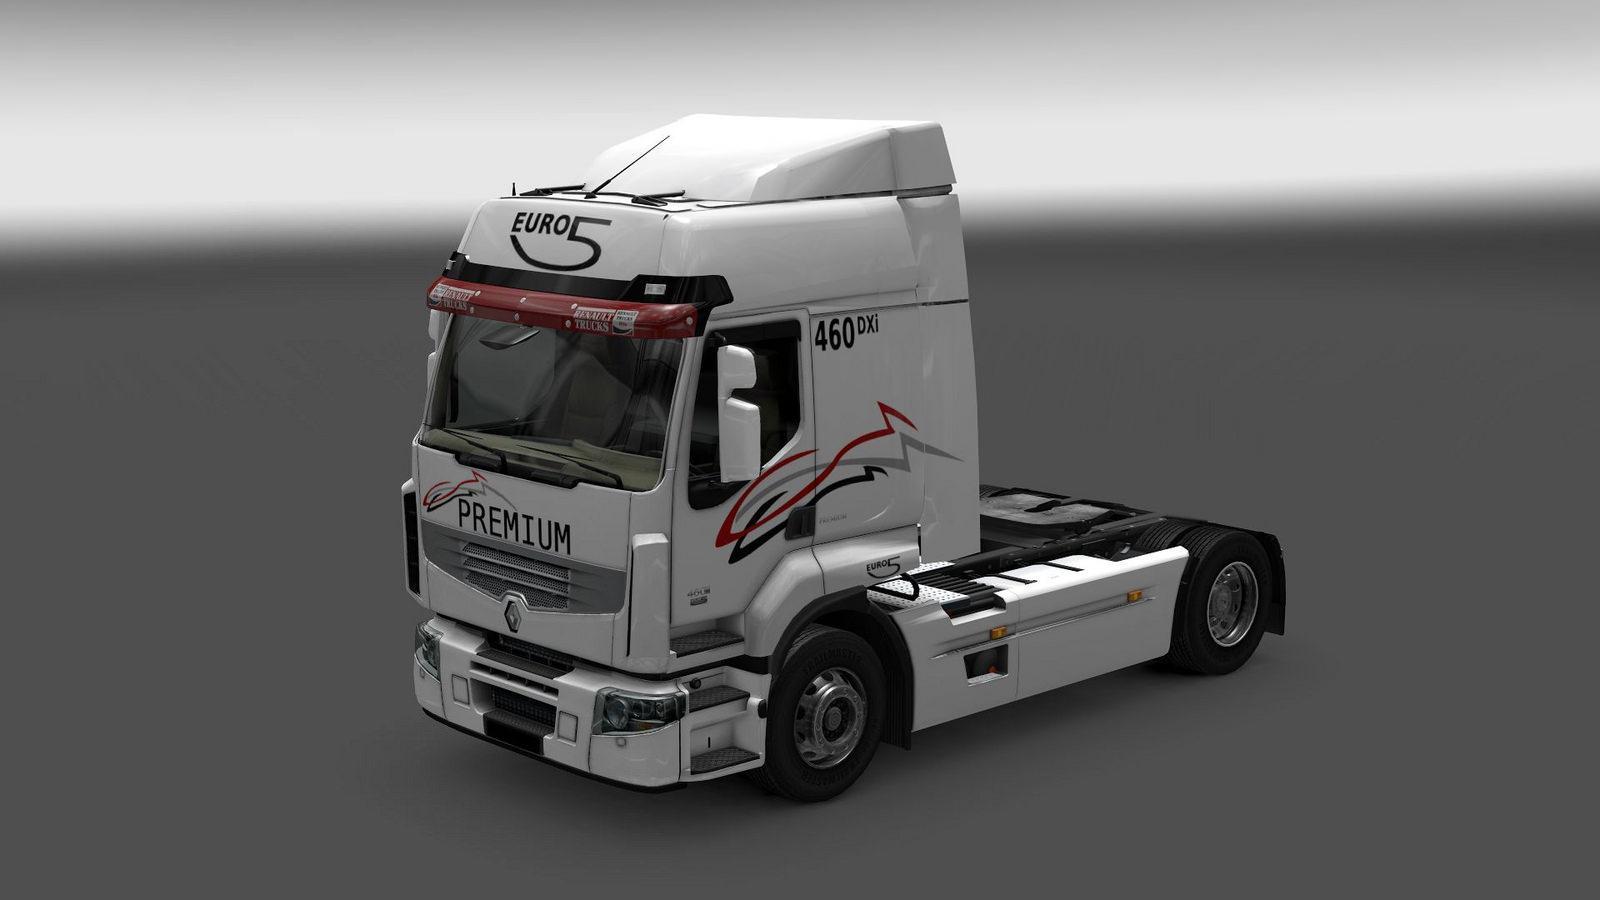 Seat Skins For Trucks >> RENAULT PREMIUM V2.4 Truck -Euro Truck Simulator 2 Mods